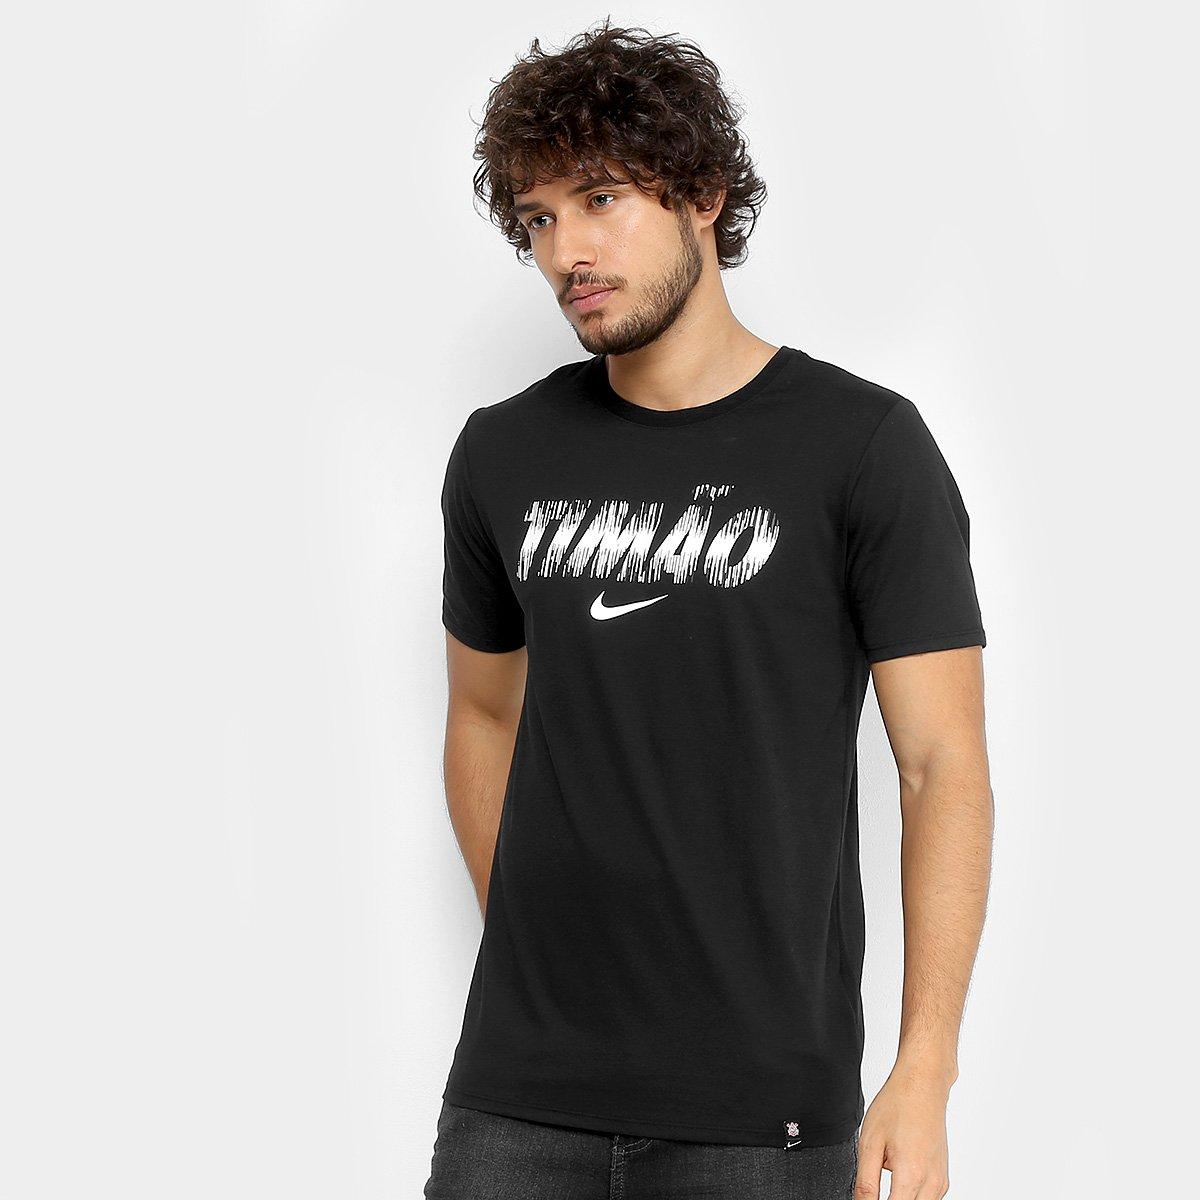 b97b439653 Camiseta Corinthians Nike Dry Masculina